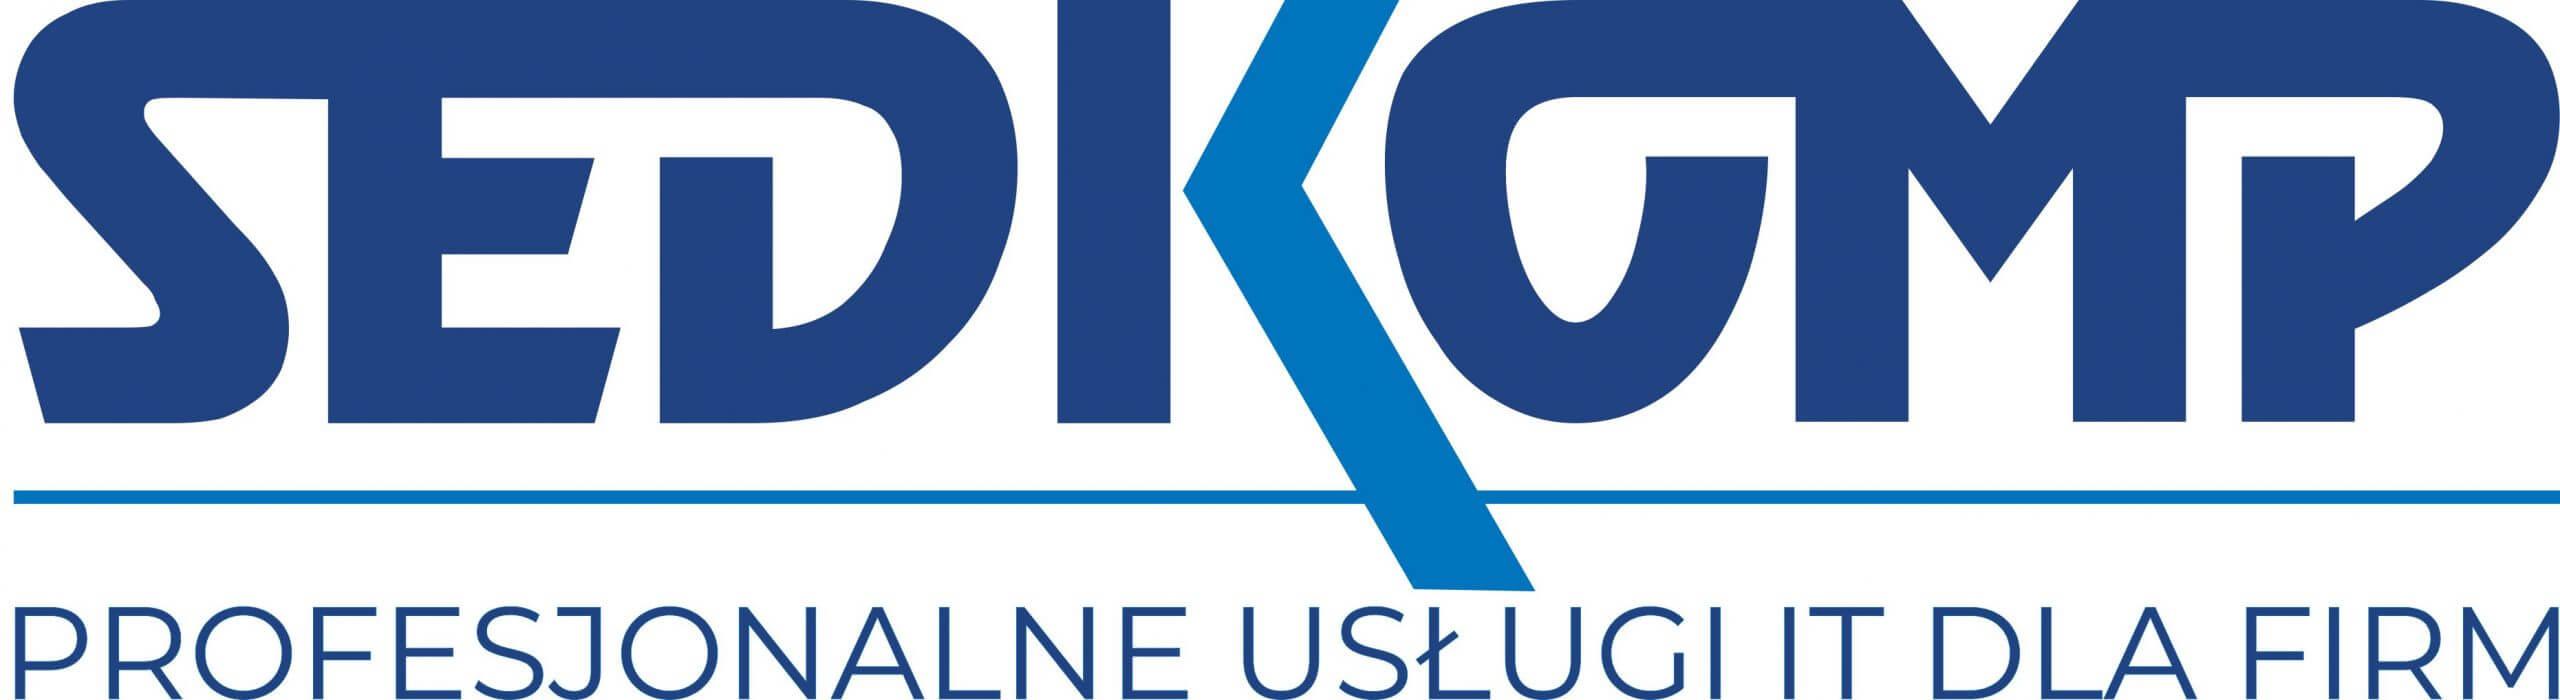 logo Sedkomp